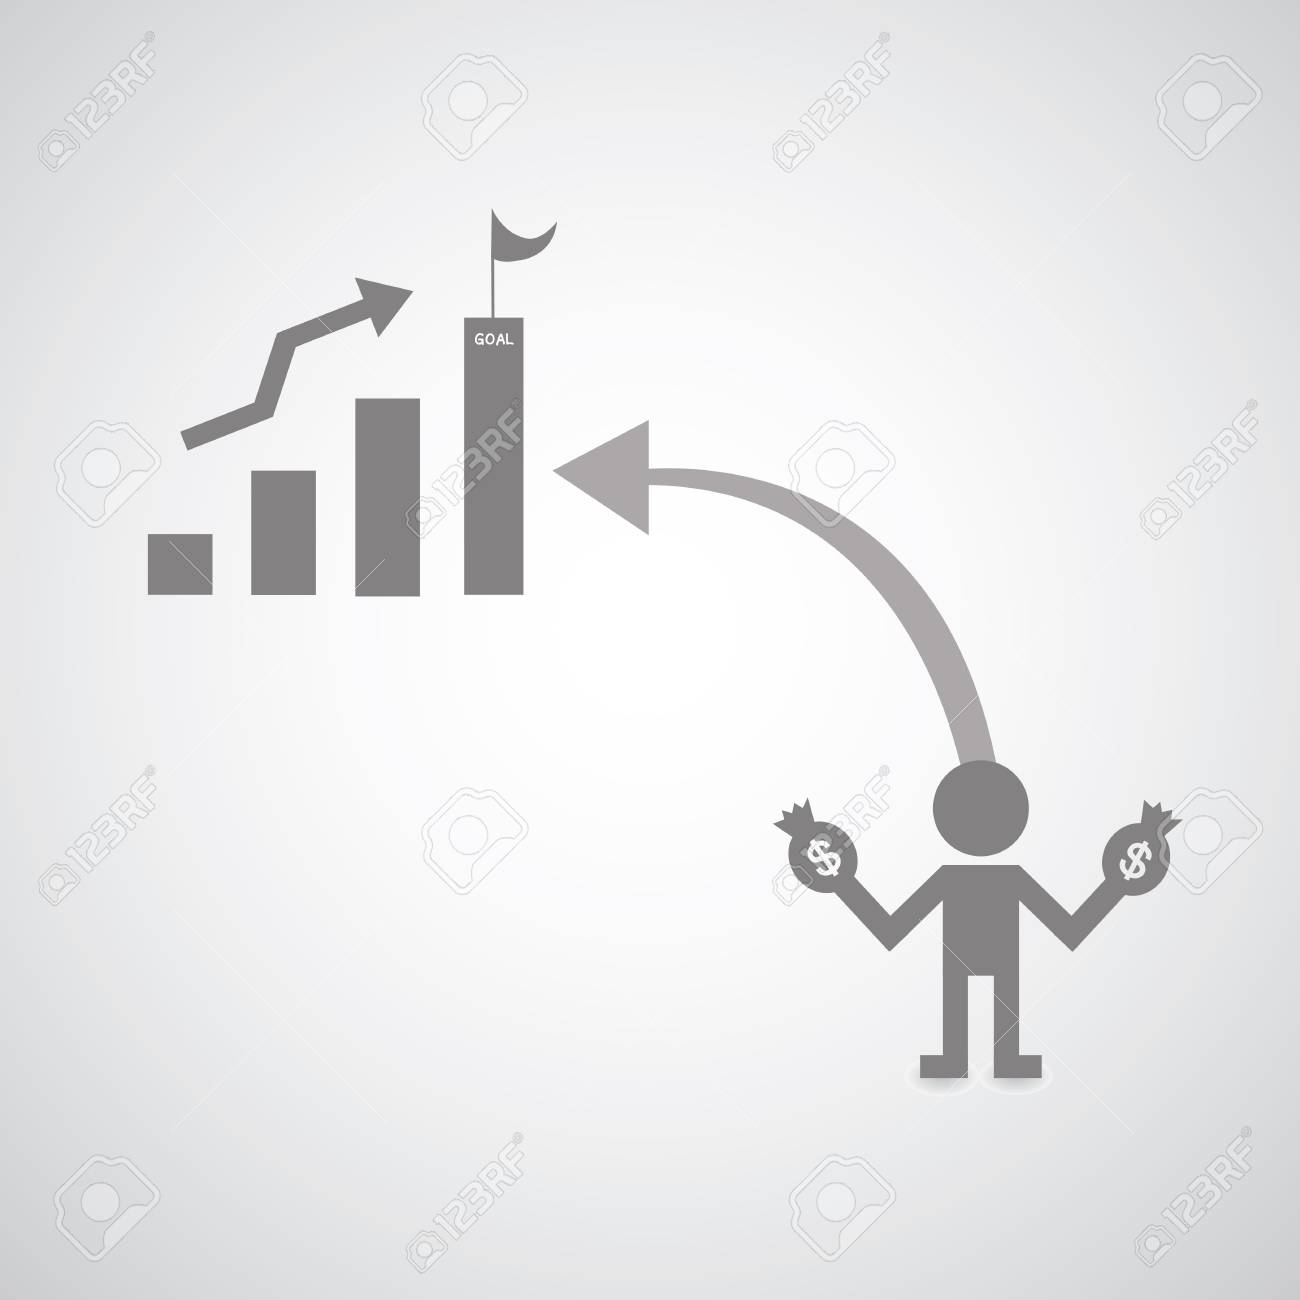 businessman symbol on gray background Stock Vector - 21881112